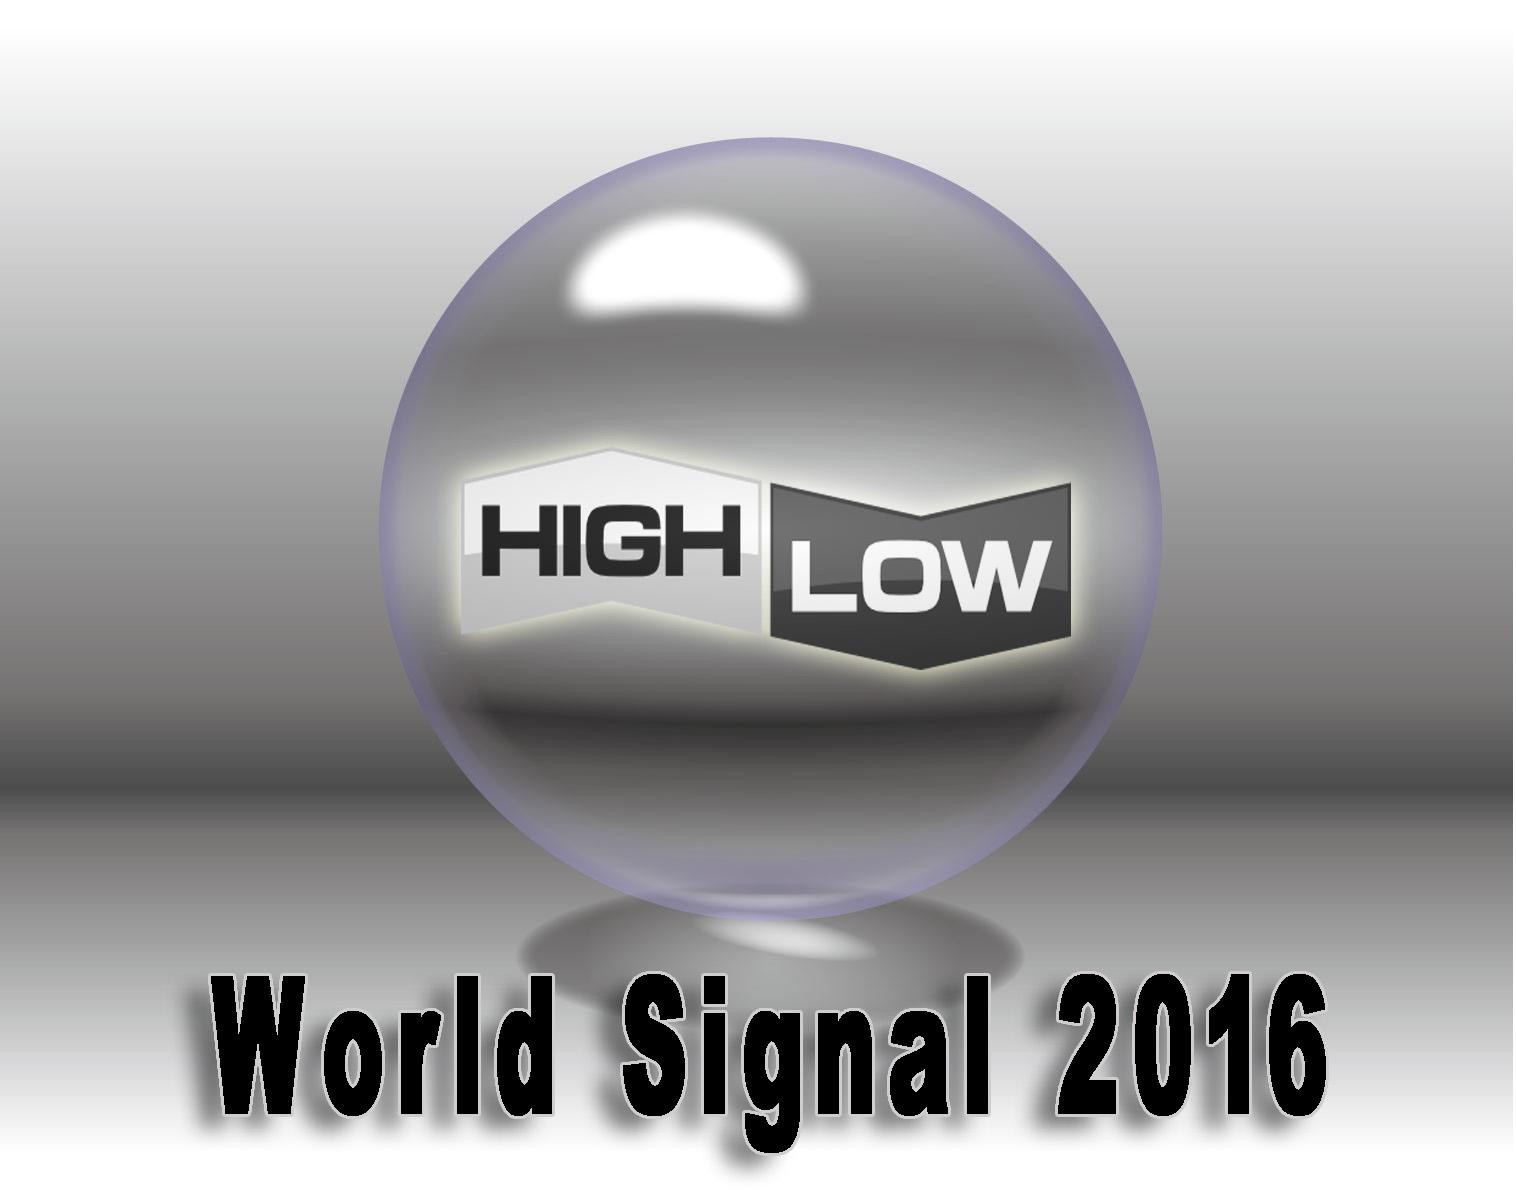 World Signal 2016